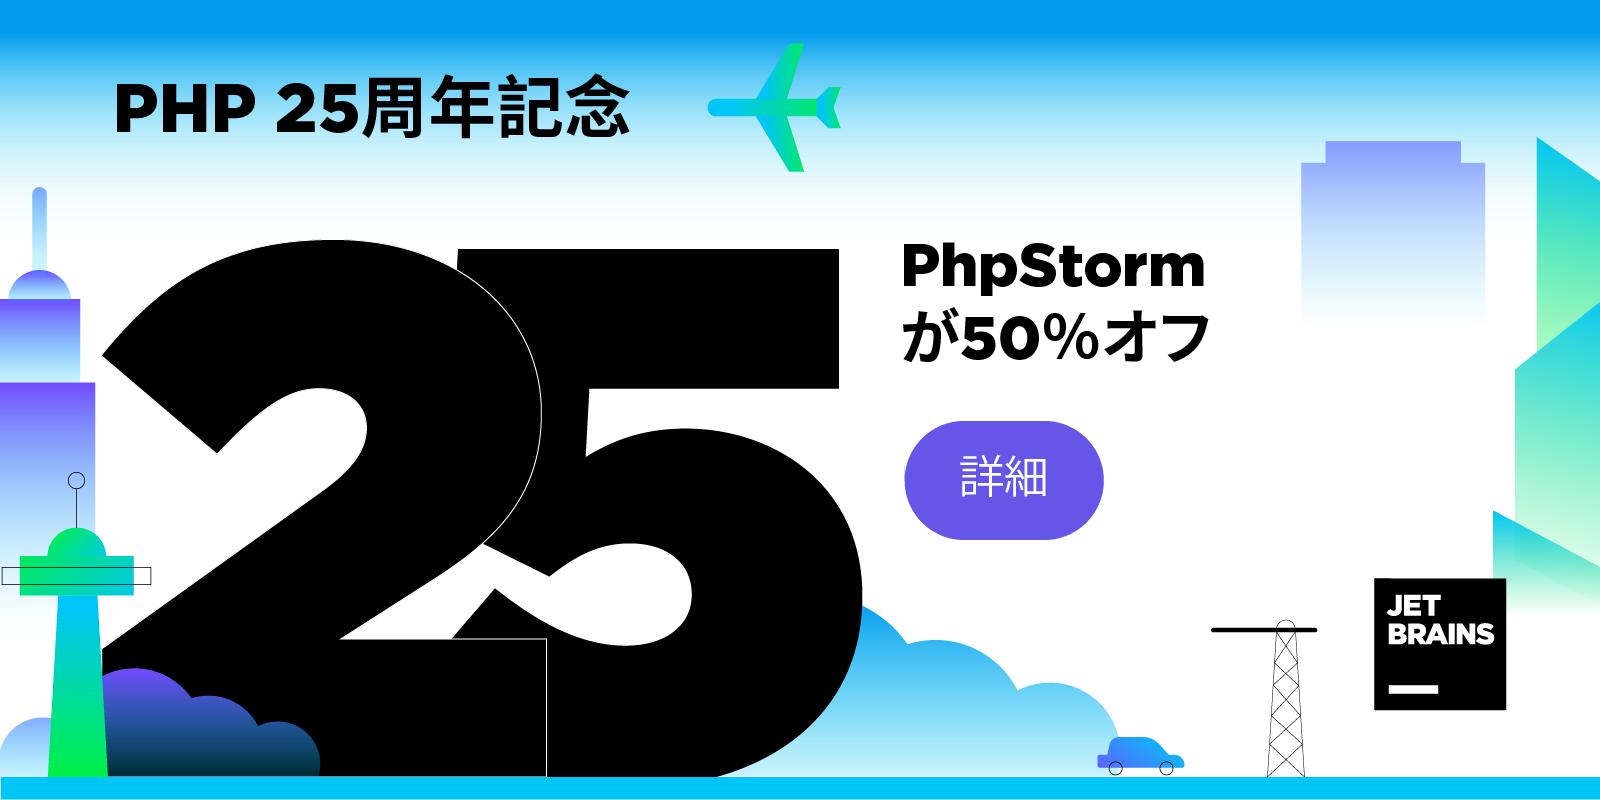 PHP 25 - blog - JP